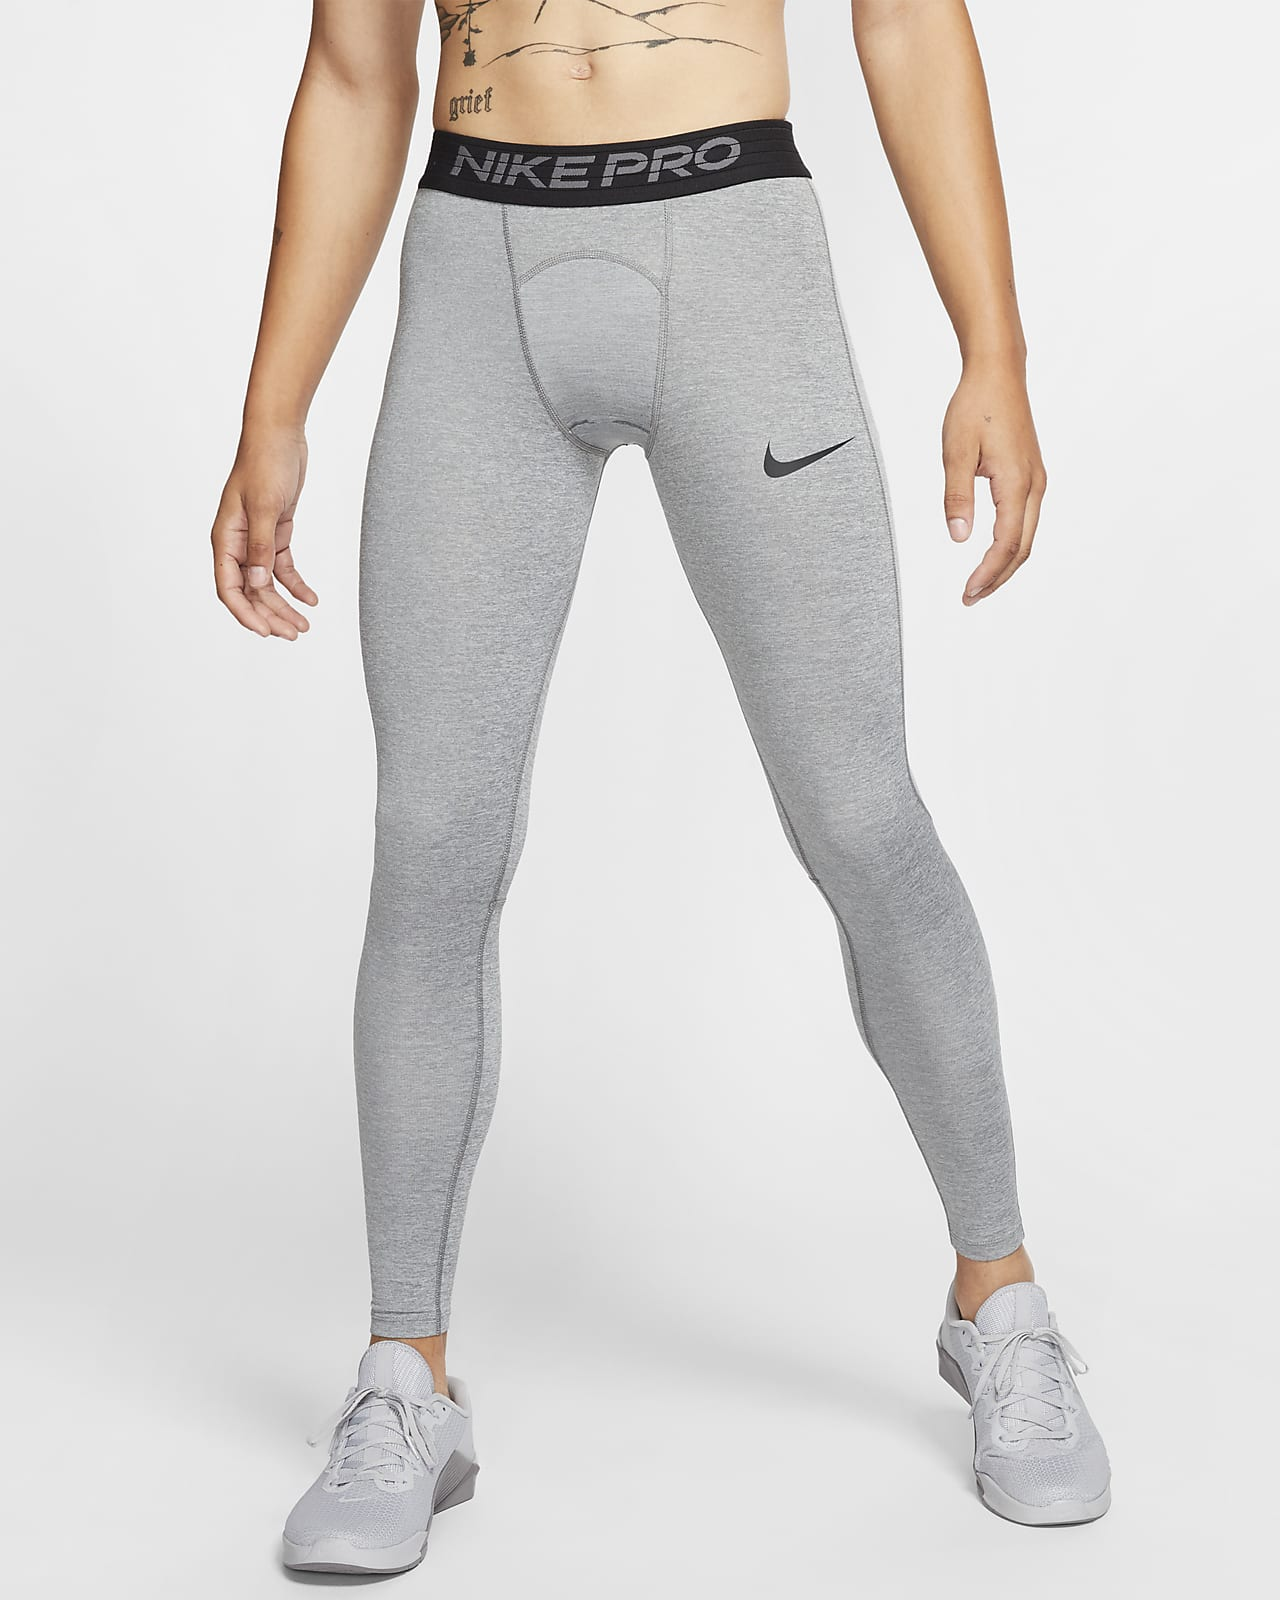 Мужские тайтсы Nike Pro